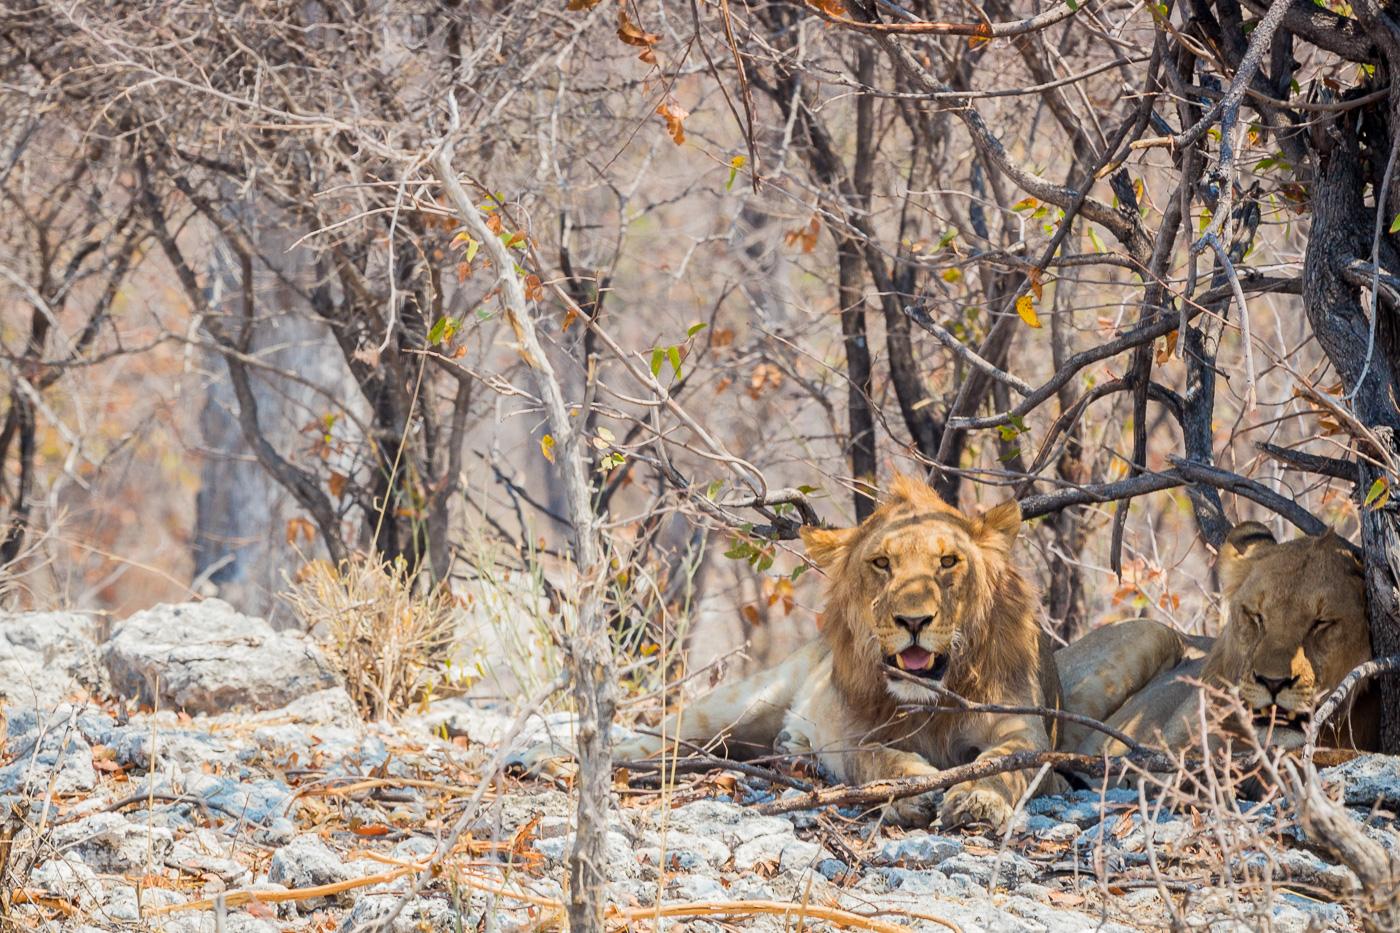 Lions at Etosha Game Reserve Self Drive Namibia